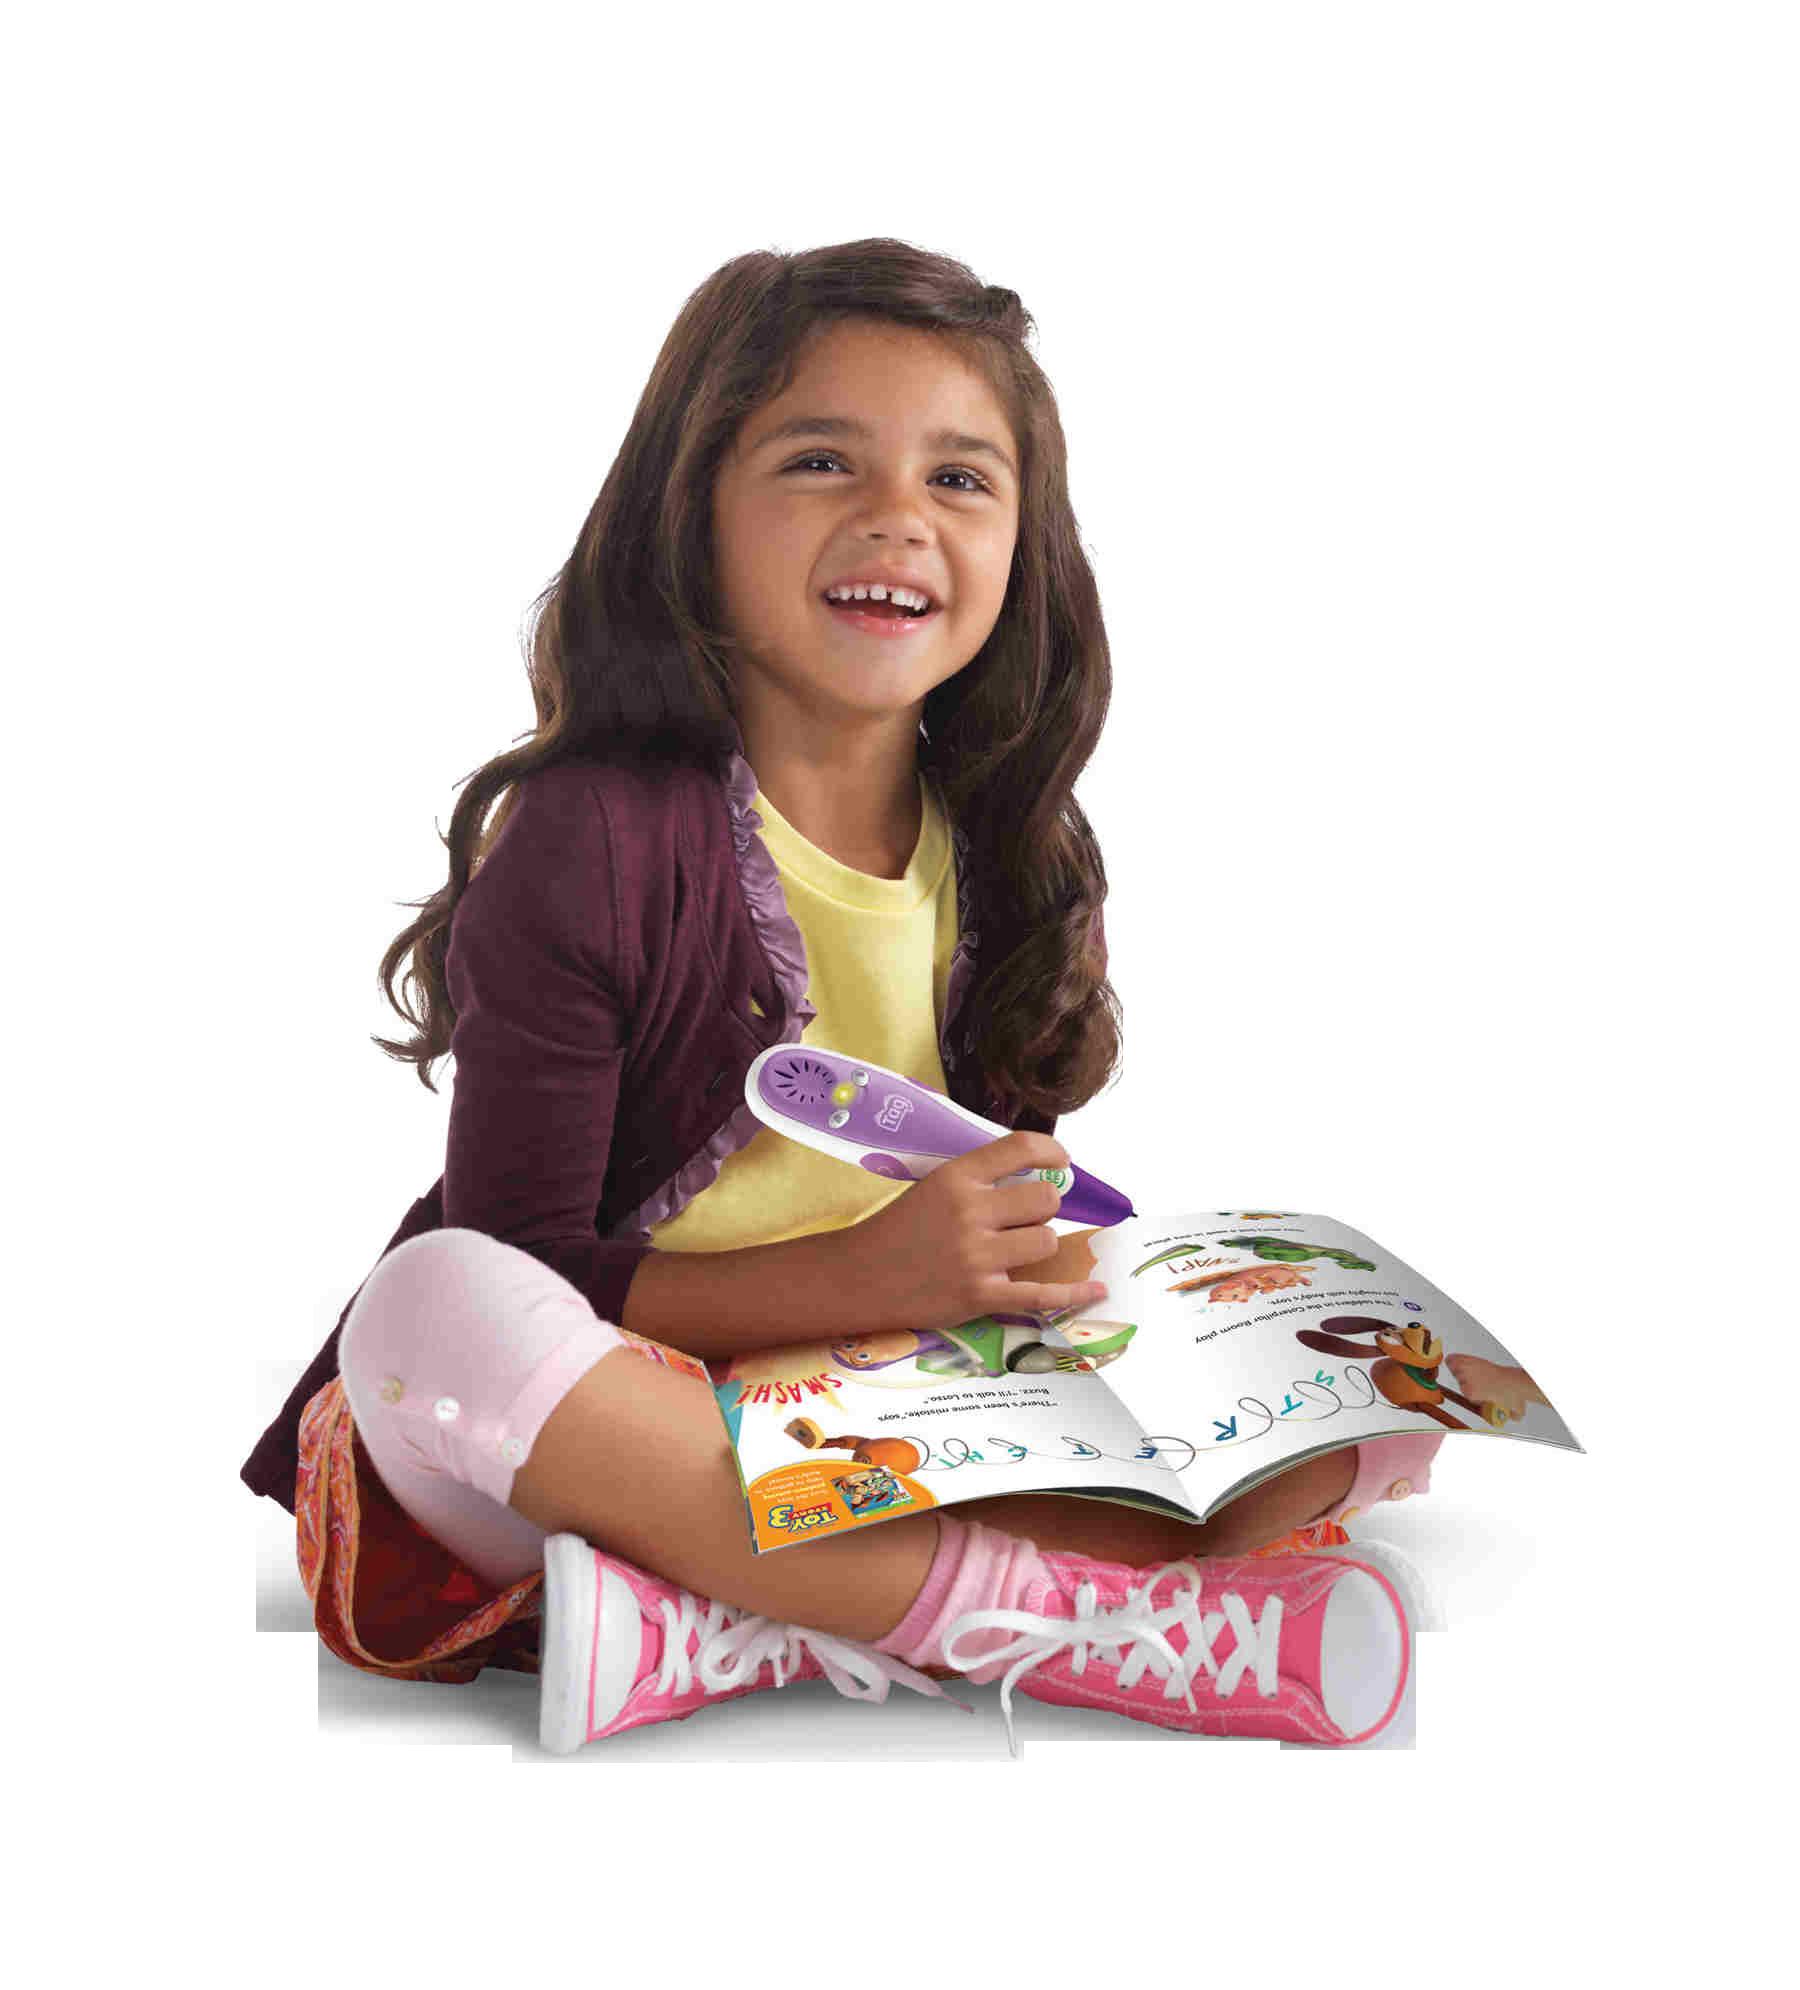 Child PNG Image - PurePNG | Free transparent CC0 PNG Image ...